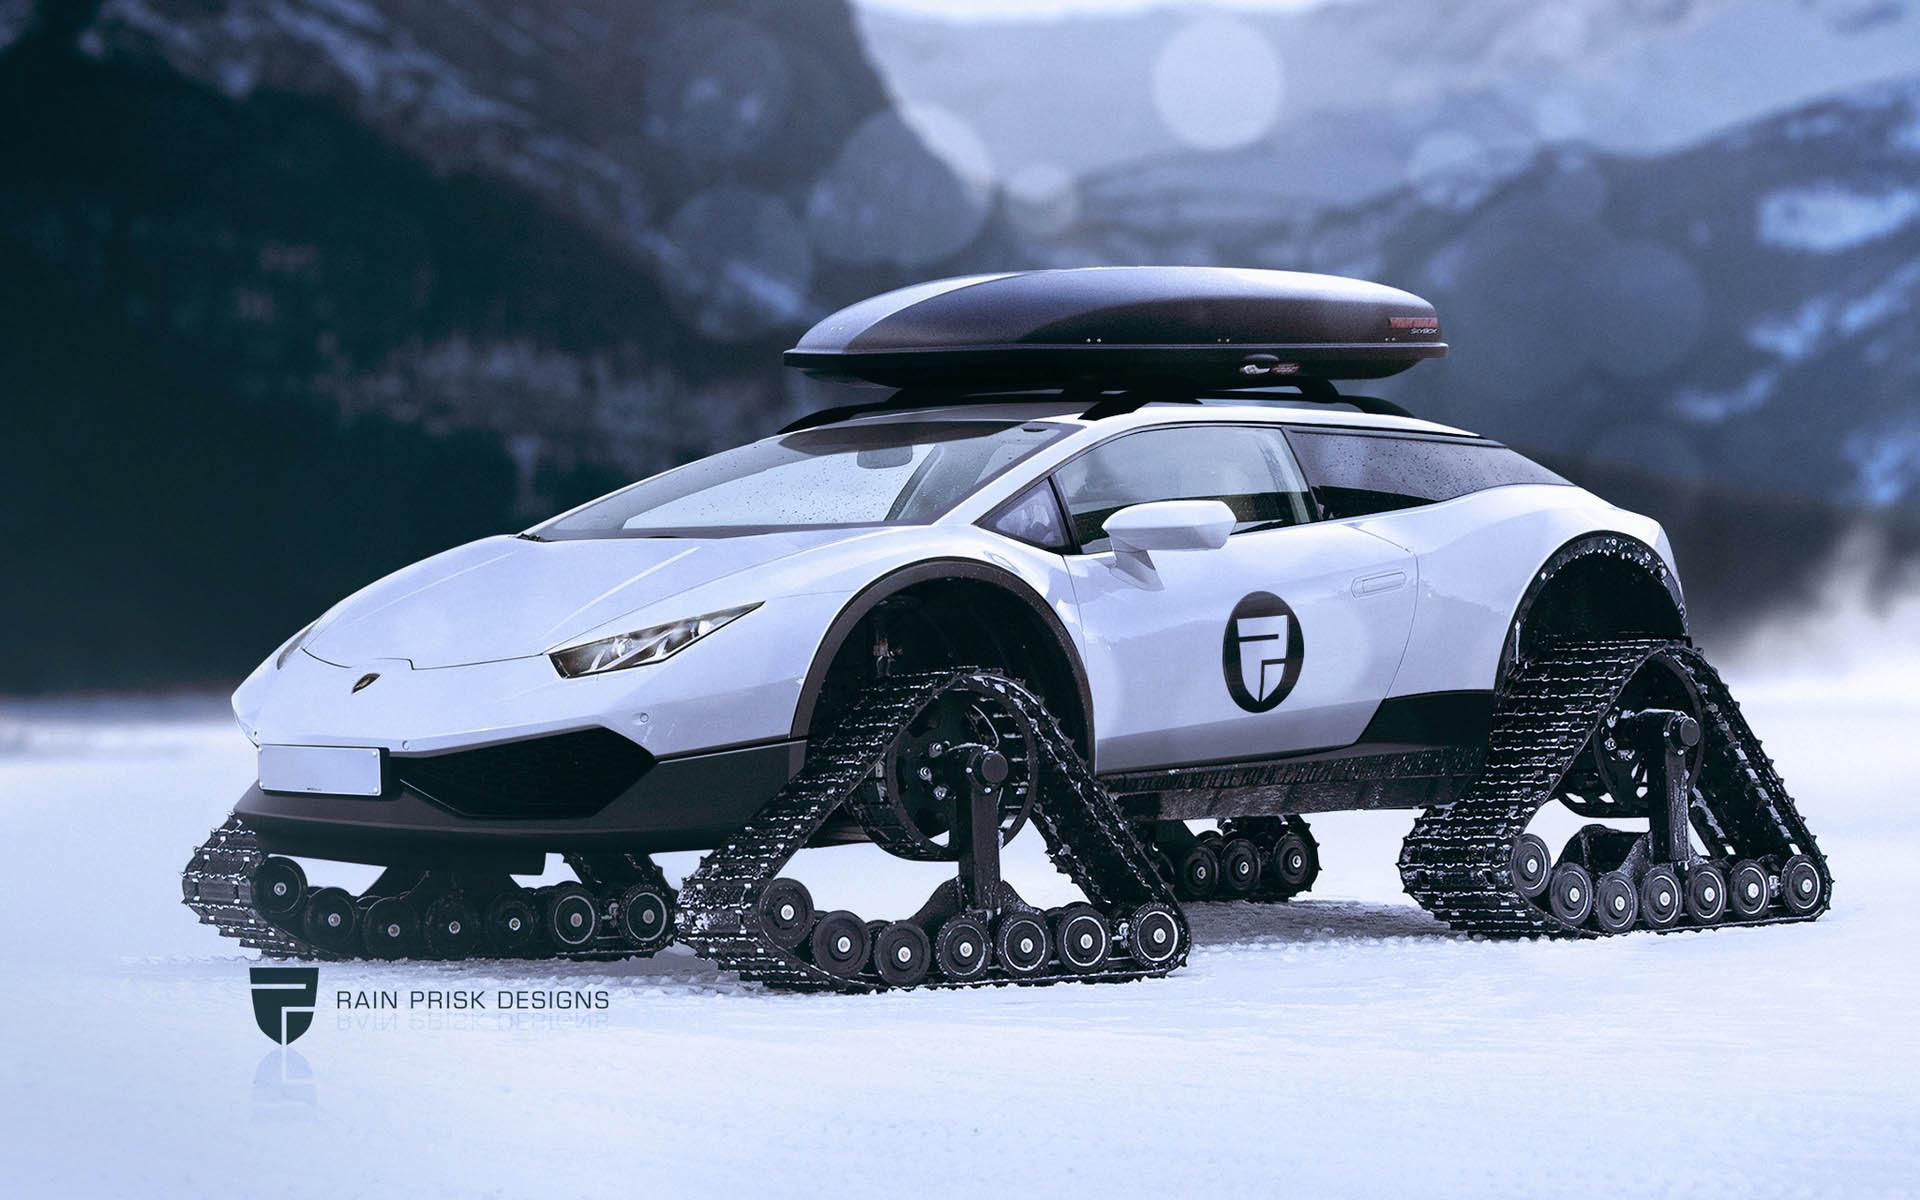 Best Off Road Tires >> Lamborghini Huracán Snowmobile: Snomo Lambo - Technabob